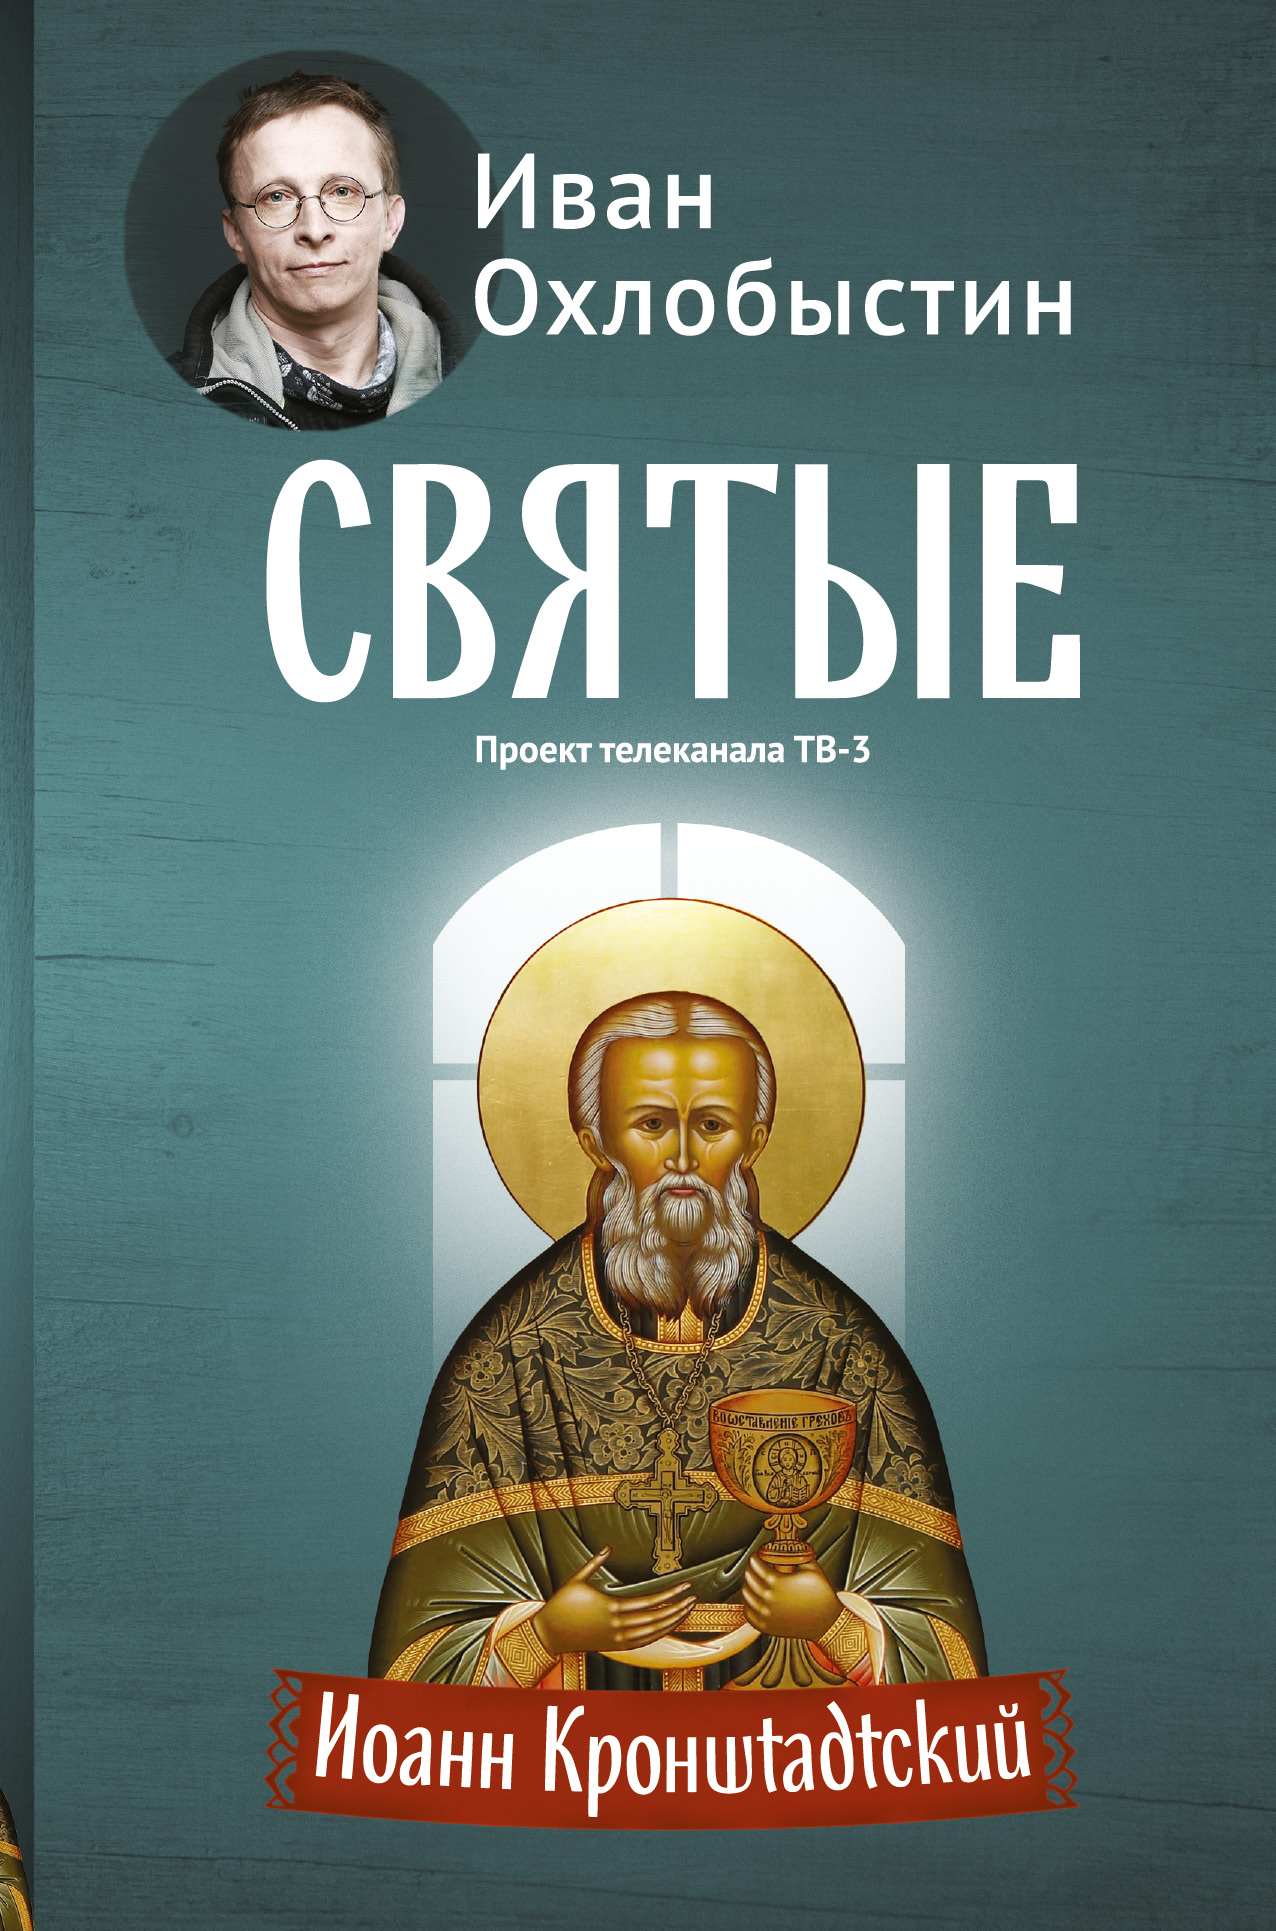 ОХЛОБЫСТИН И. Иоанн Кронштадтский